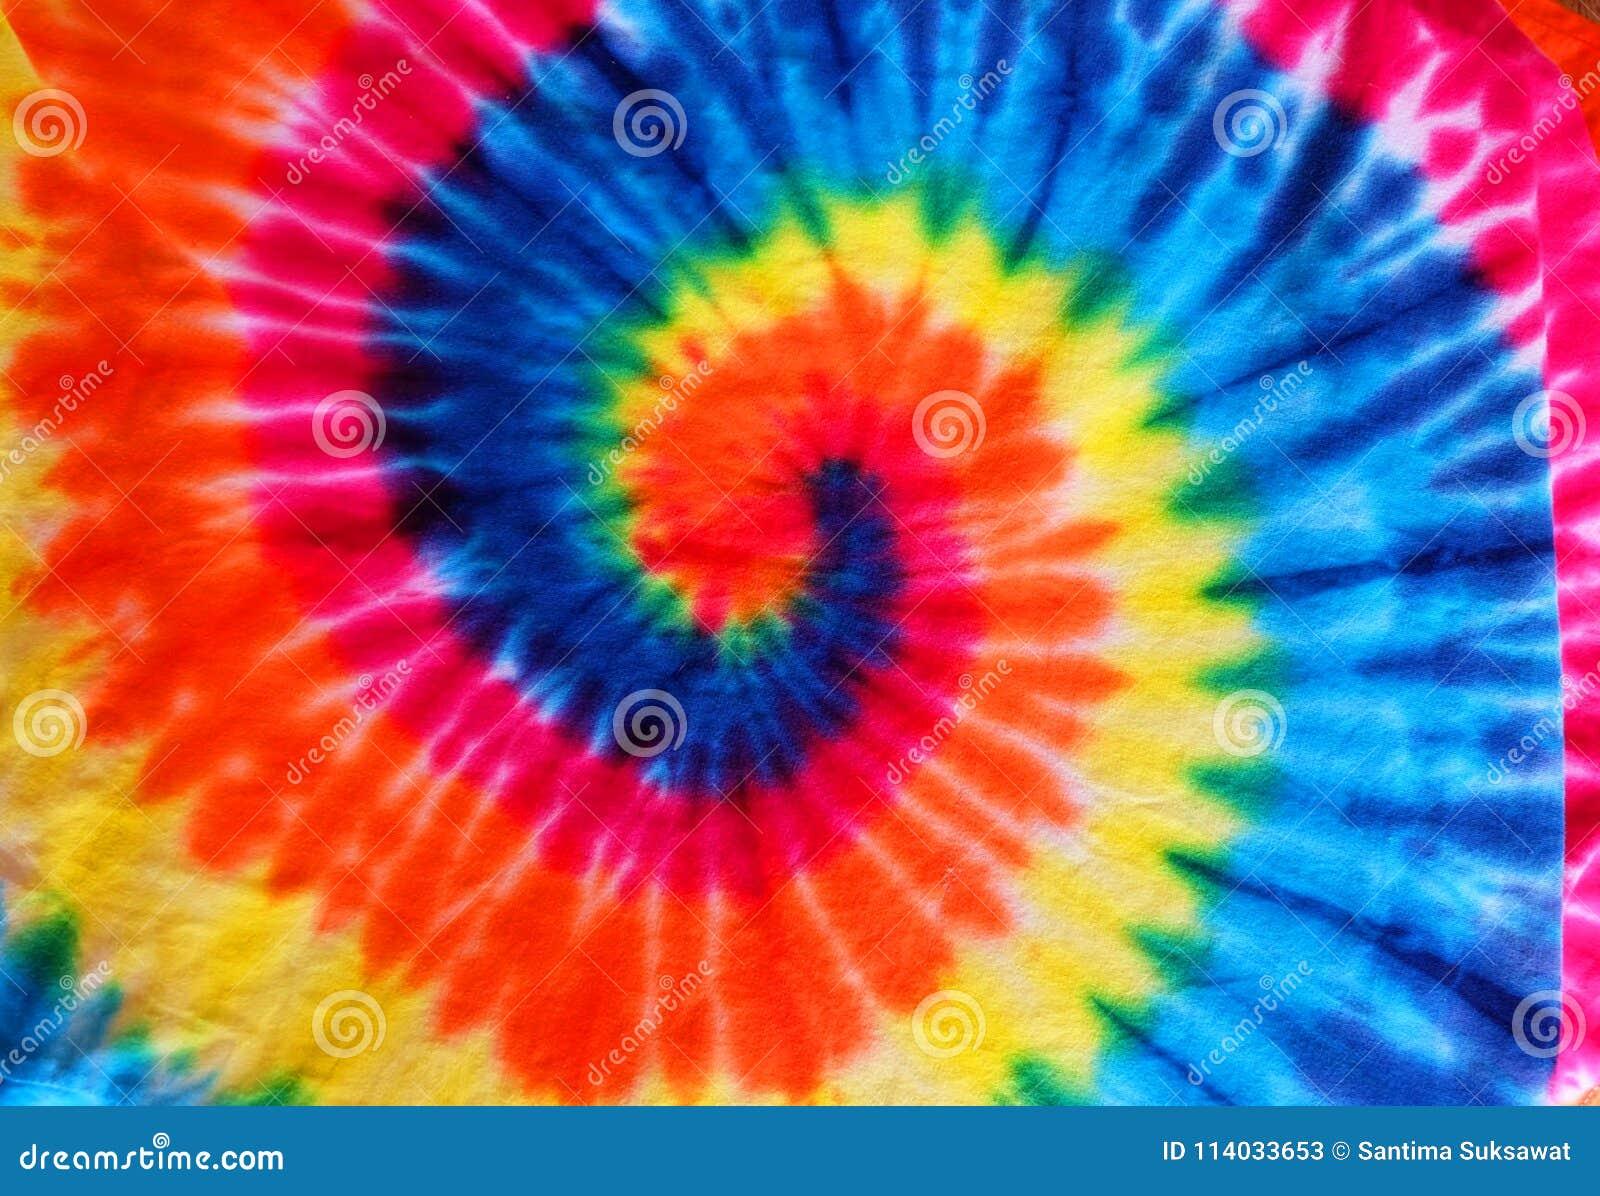 Close up tie dye fabric pattern background